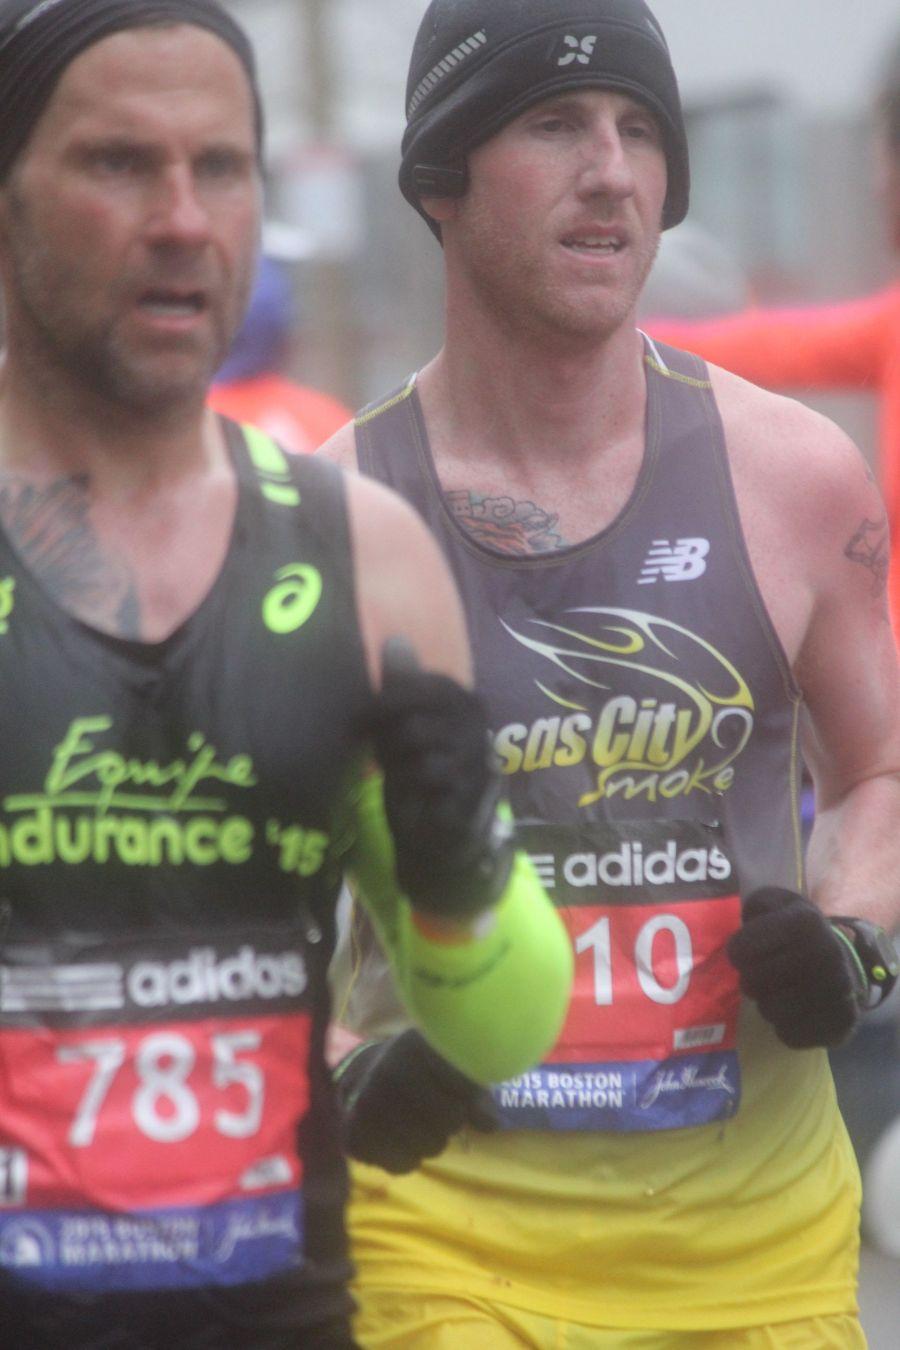 boston marathon april 20 2015 racer number 785